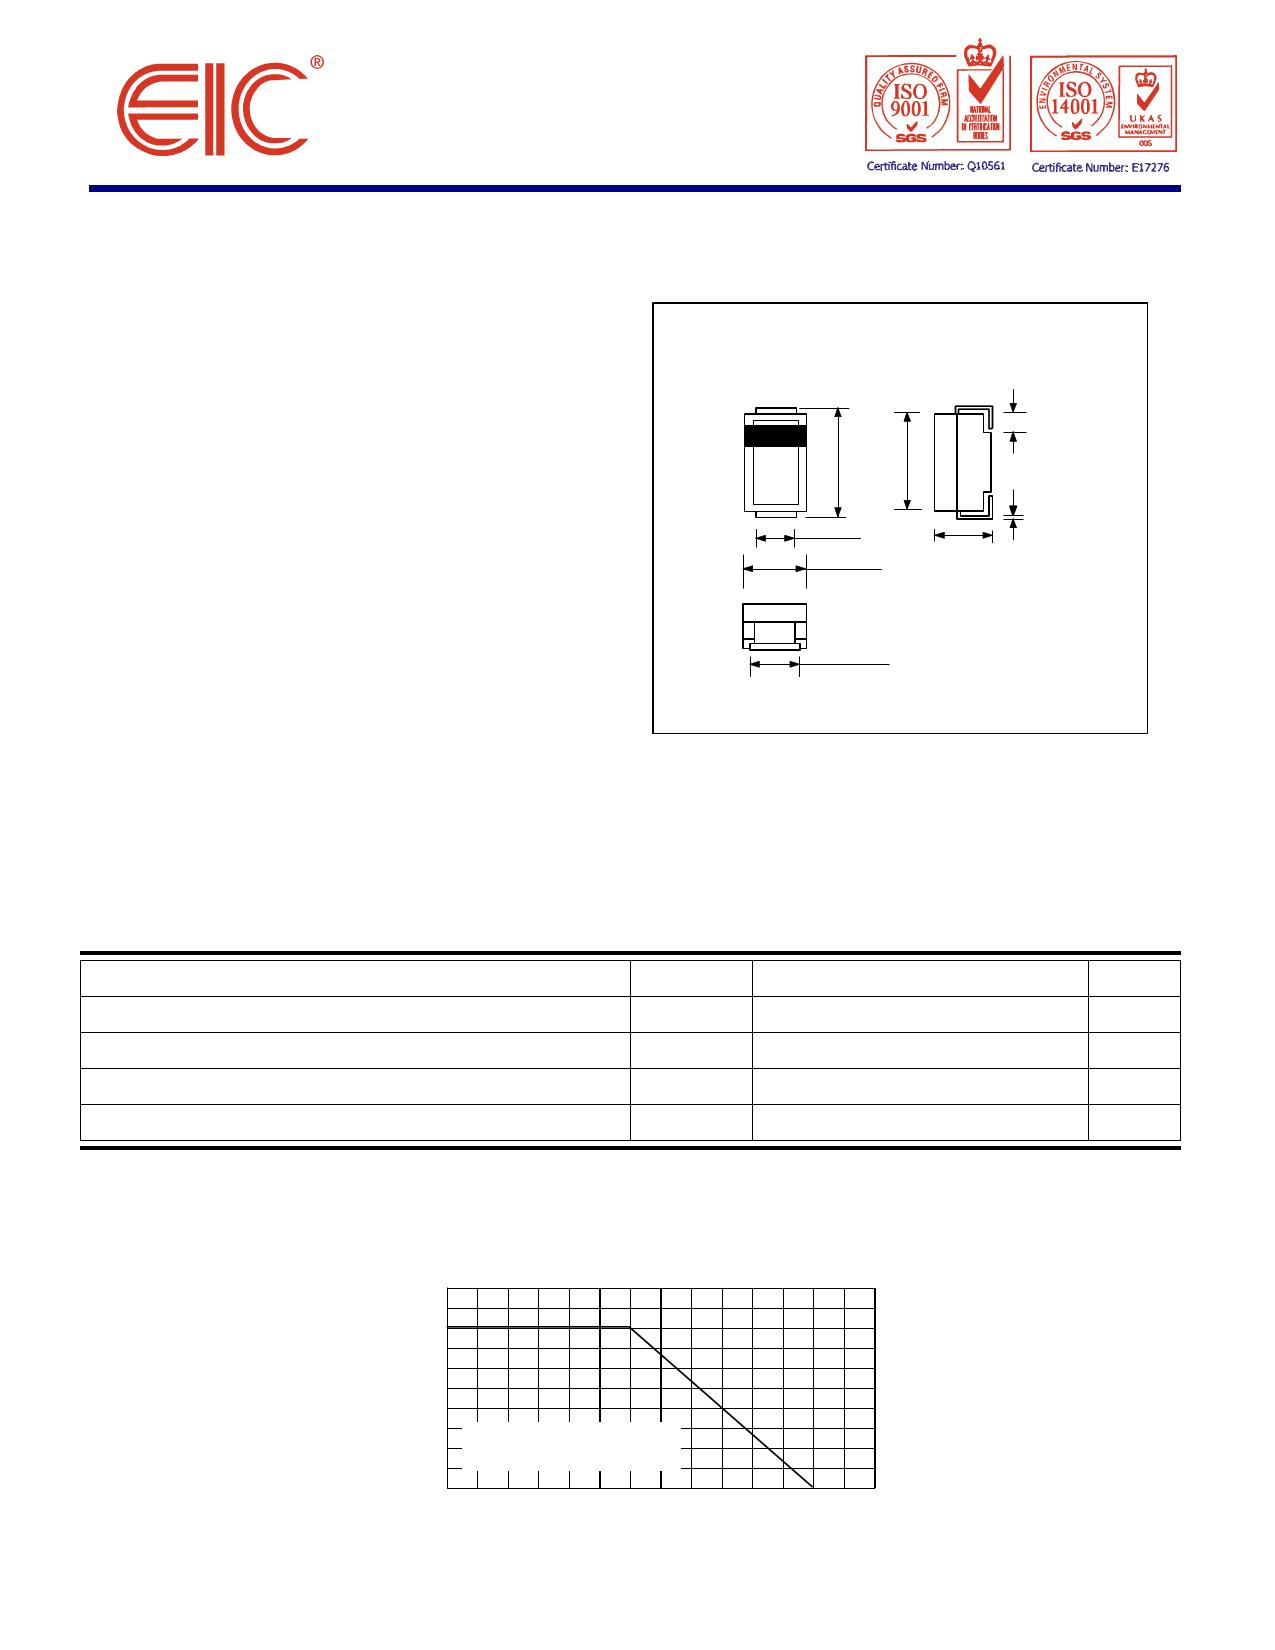 SZ40B1 datasheet, circuit